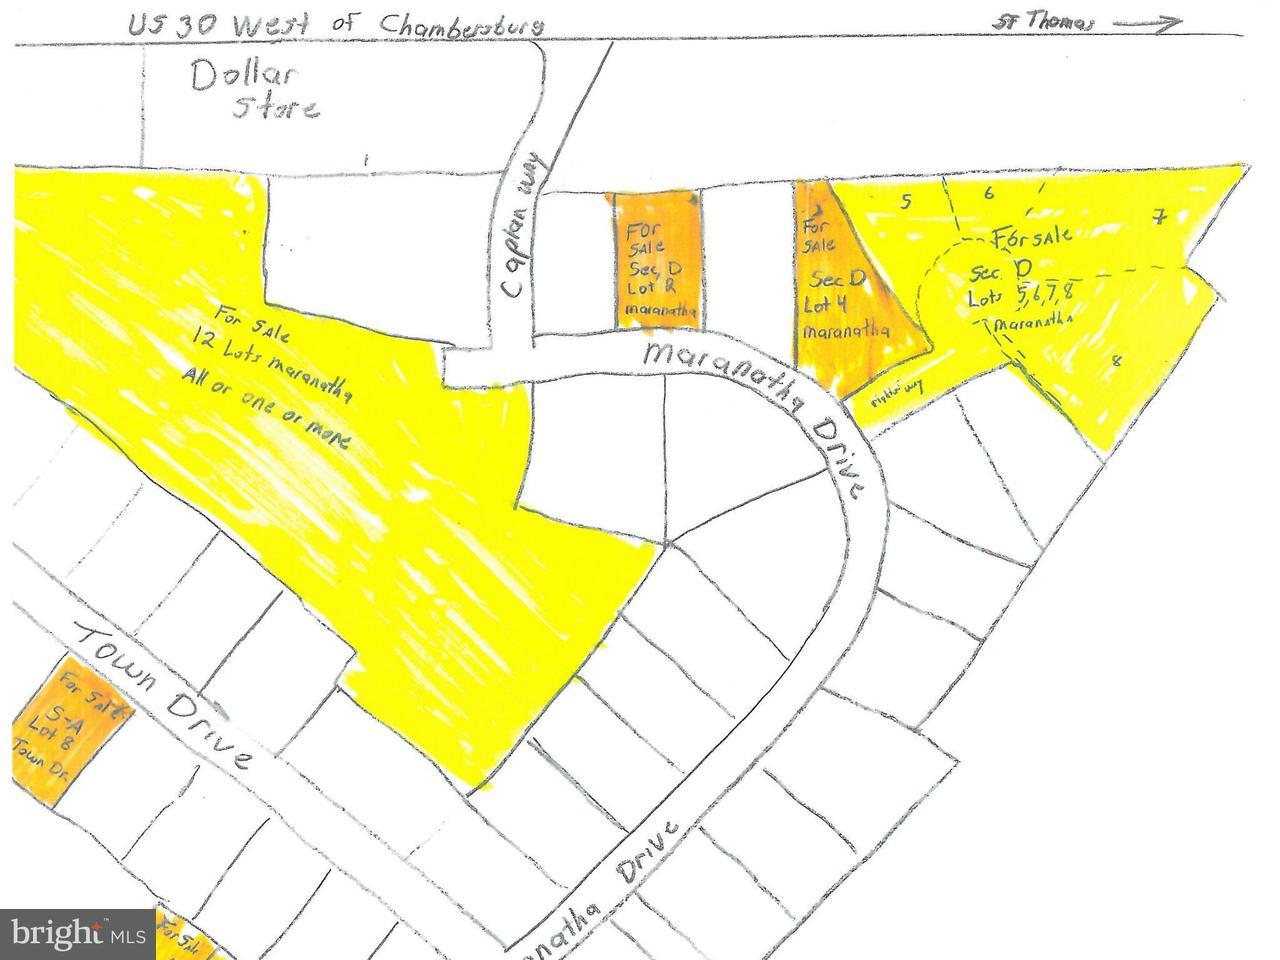 Land for Sale at Secd Lots 5,6,7,8 Maranatha Dr St. Thomas, Pennsylvania 17252 United States